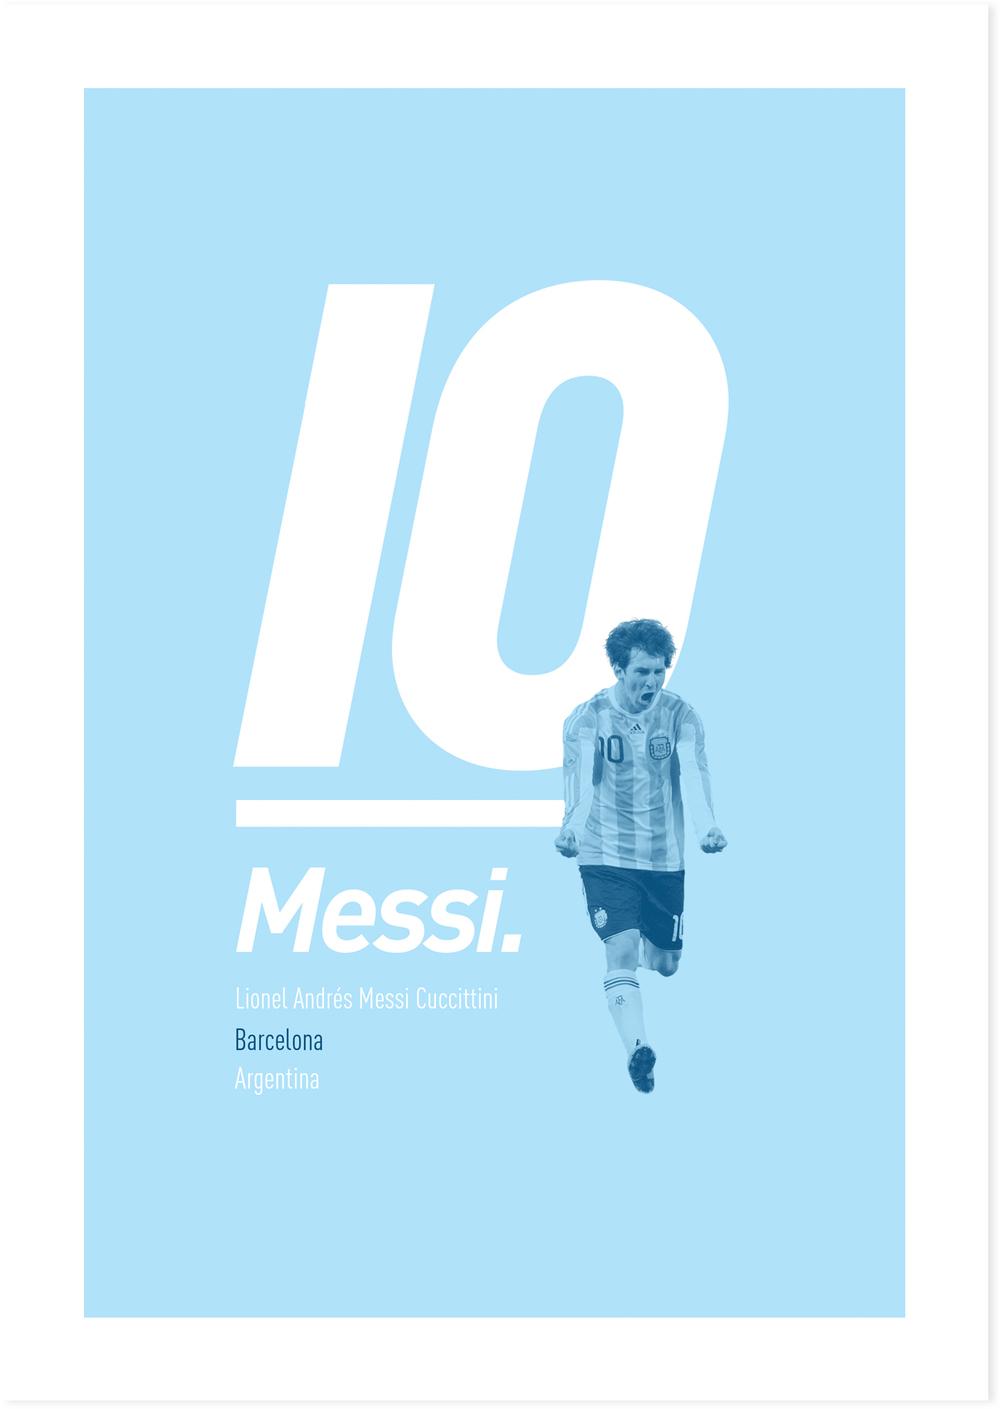 Messi_web.jpg